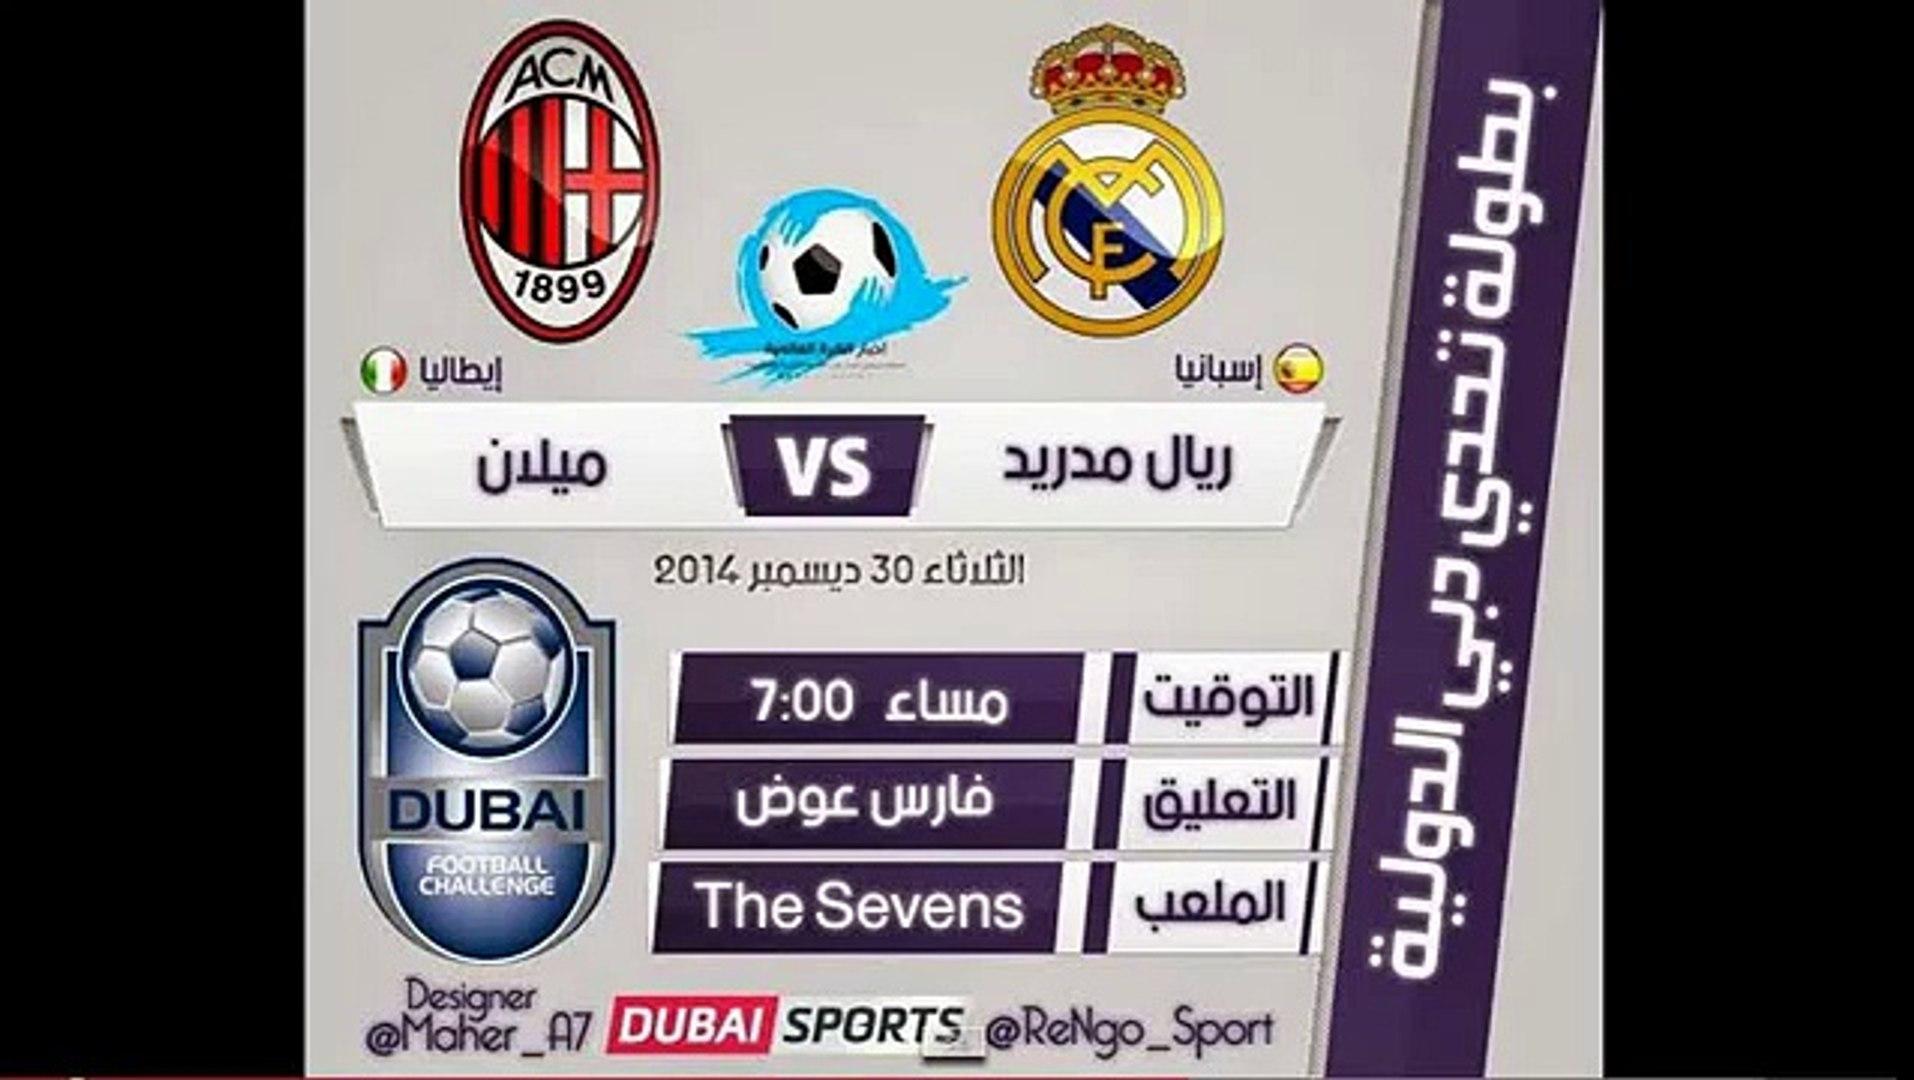 مشاهدة مباراة البحرين و الامارات بث مباشر اون لاين